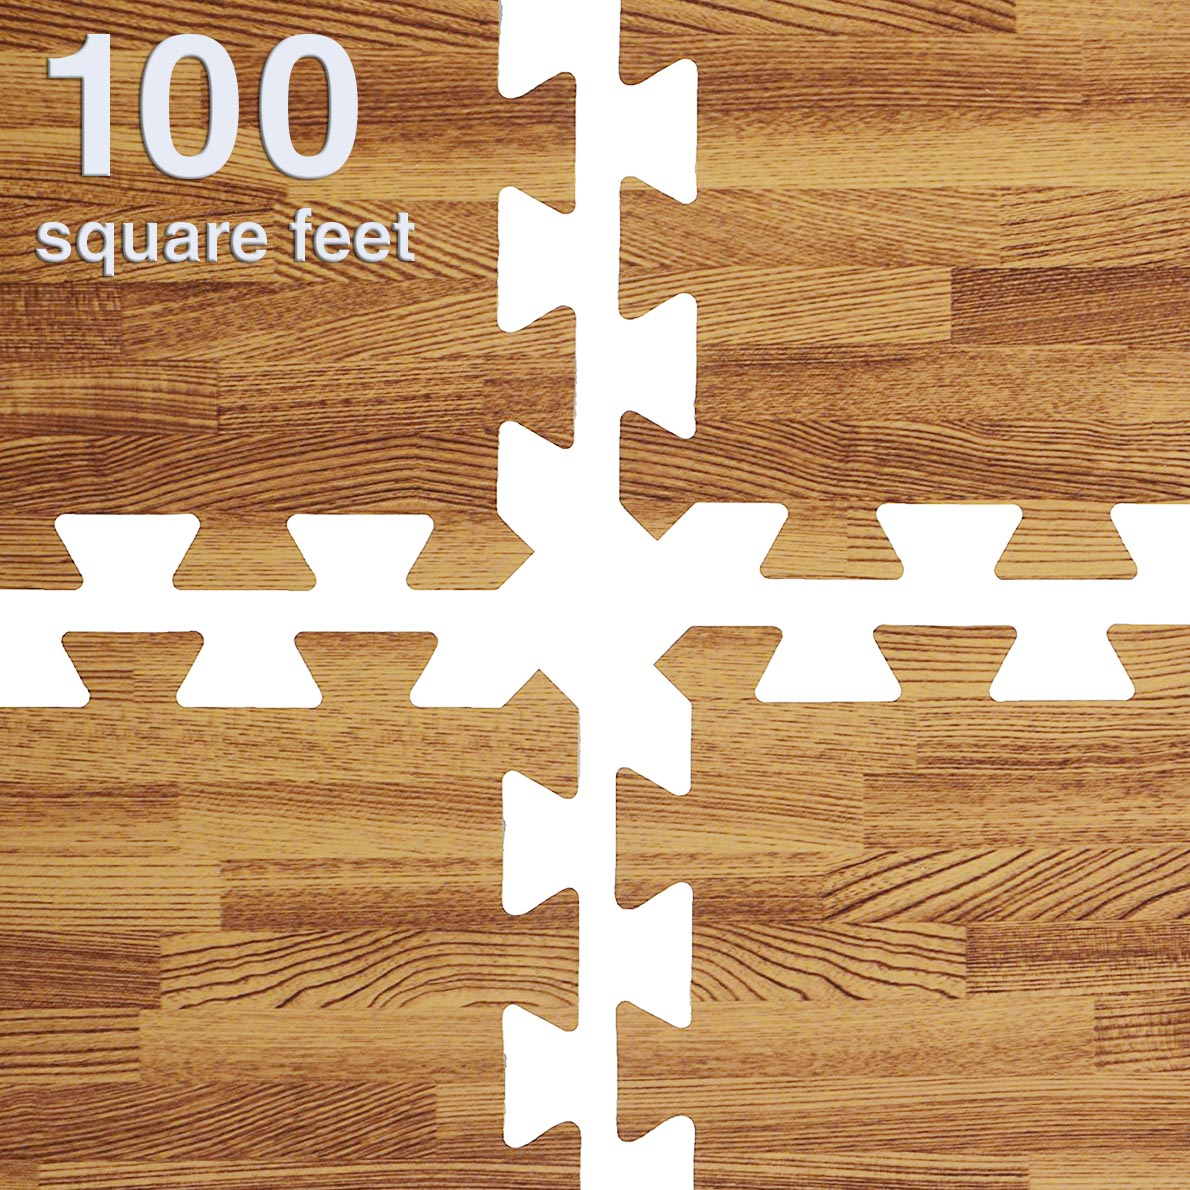 Clevr 100 SqFt EVA Light Wood Grain Foam Mat Interlocking Flooring 25pcs Oak